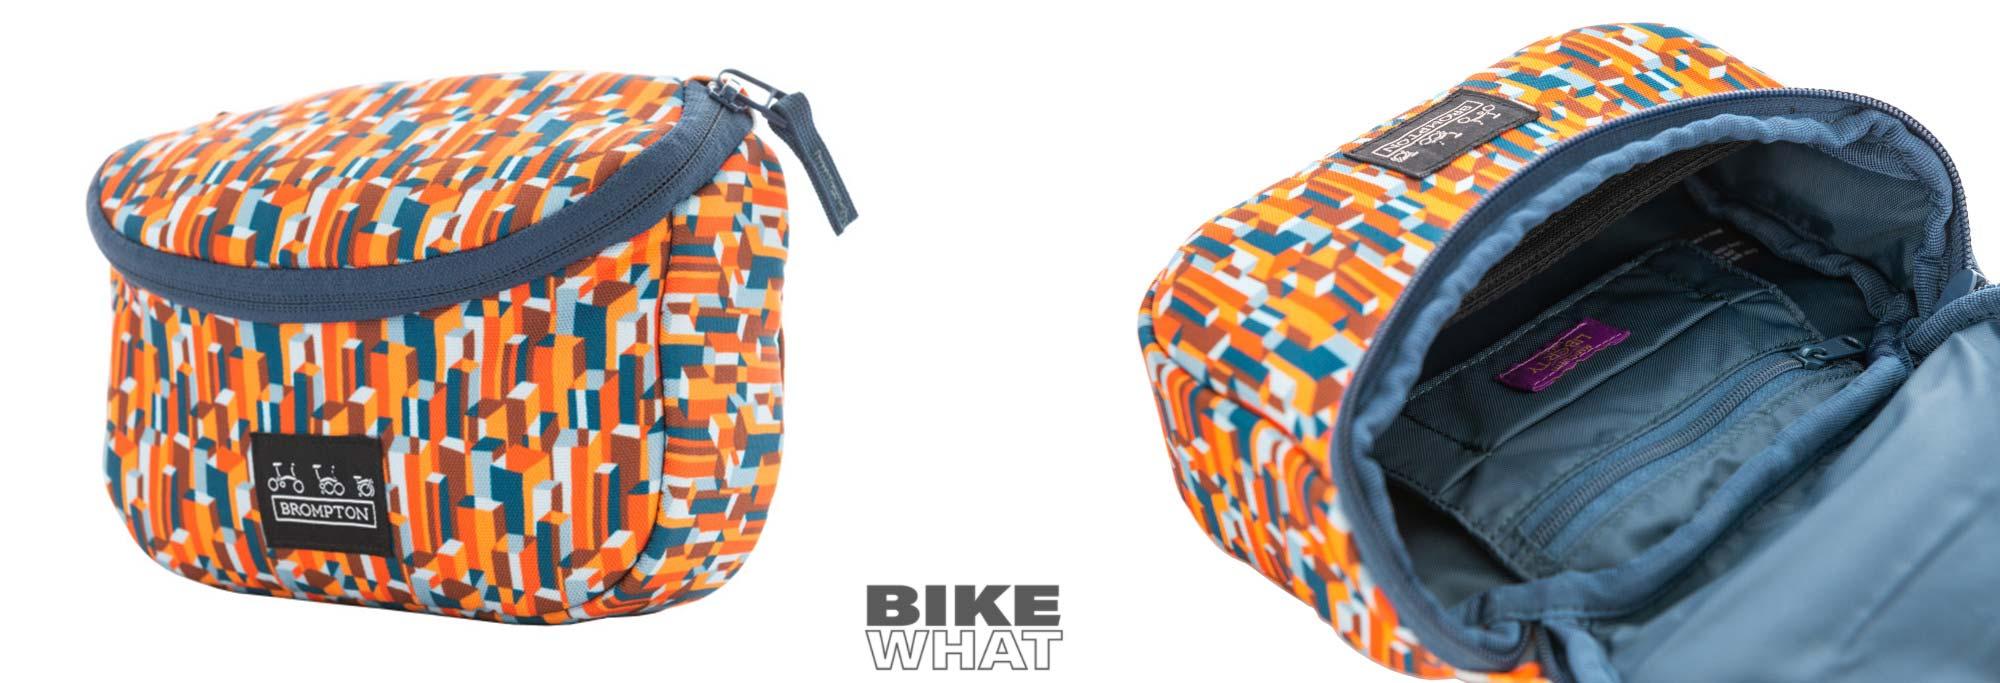 gear_Brompton-Liberty-Bag-3